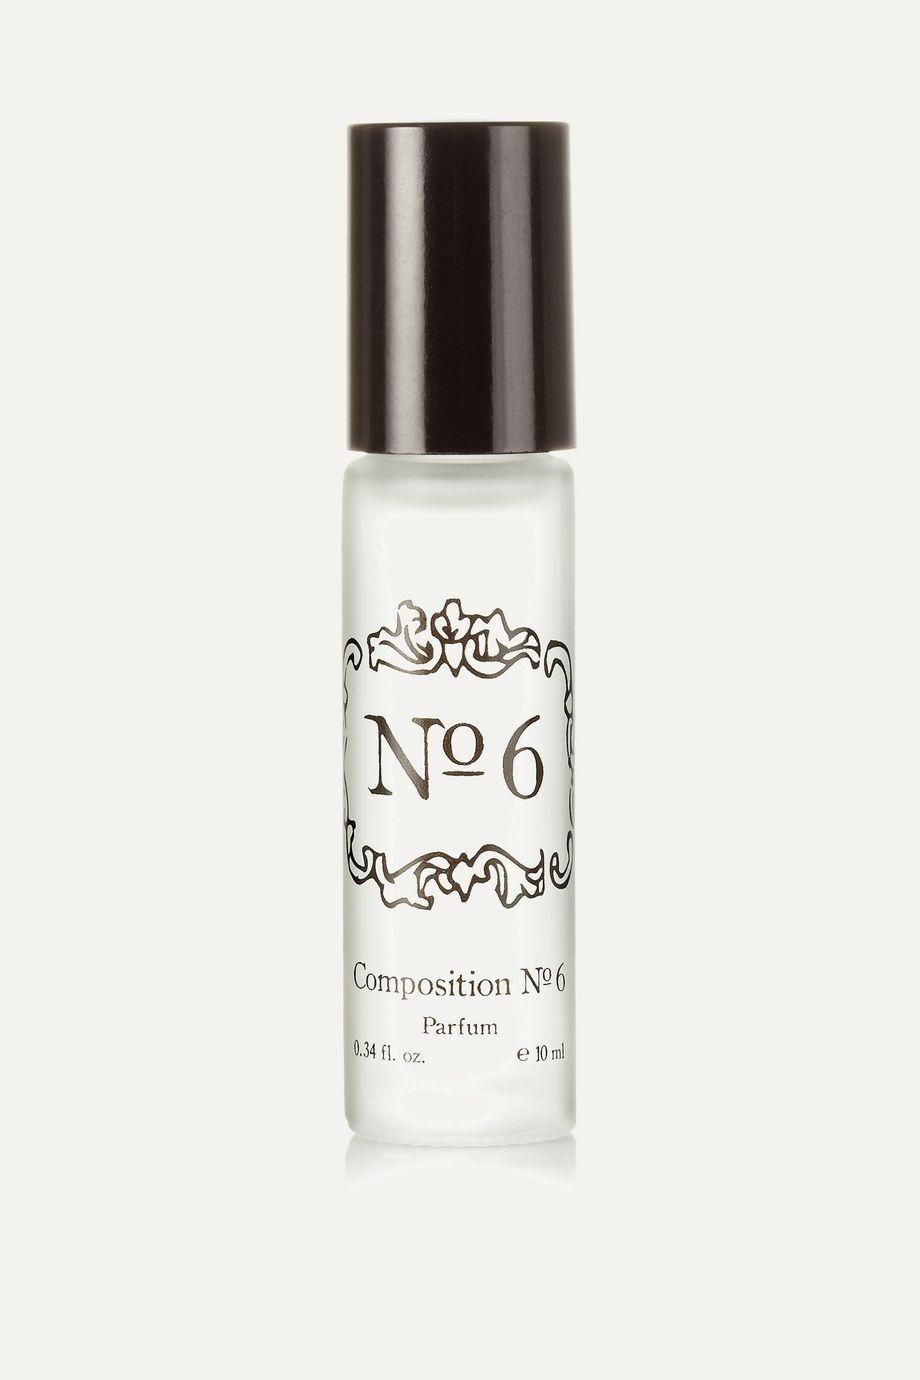 Joya Composition No. 6 Roll-On Parfum - FujianCypress, Juniper Berries & Tangy Yuzu, 10ml